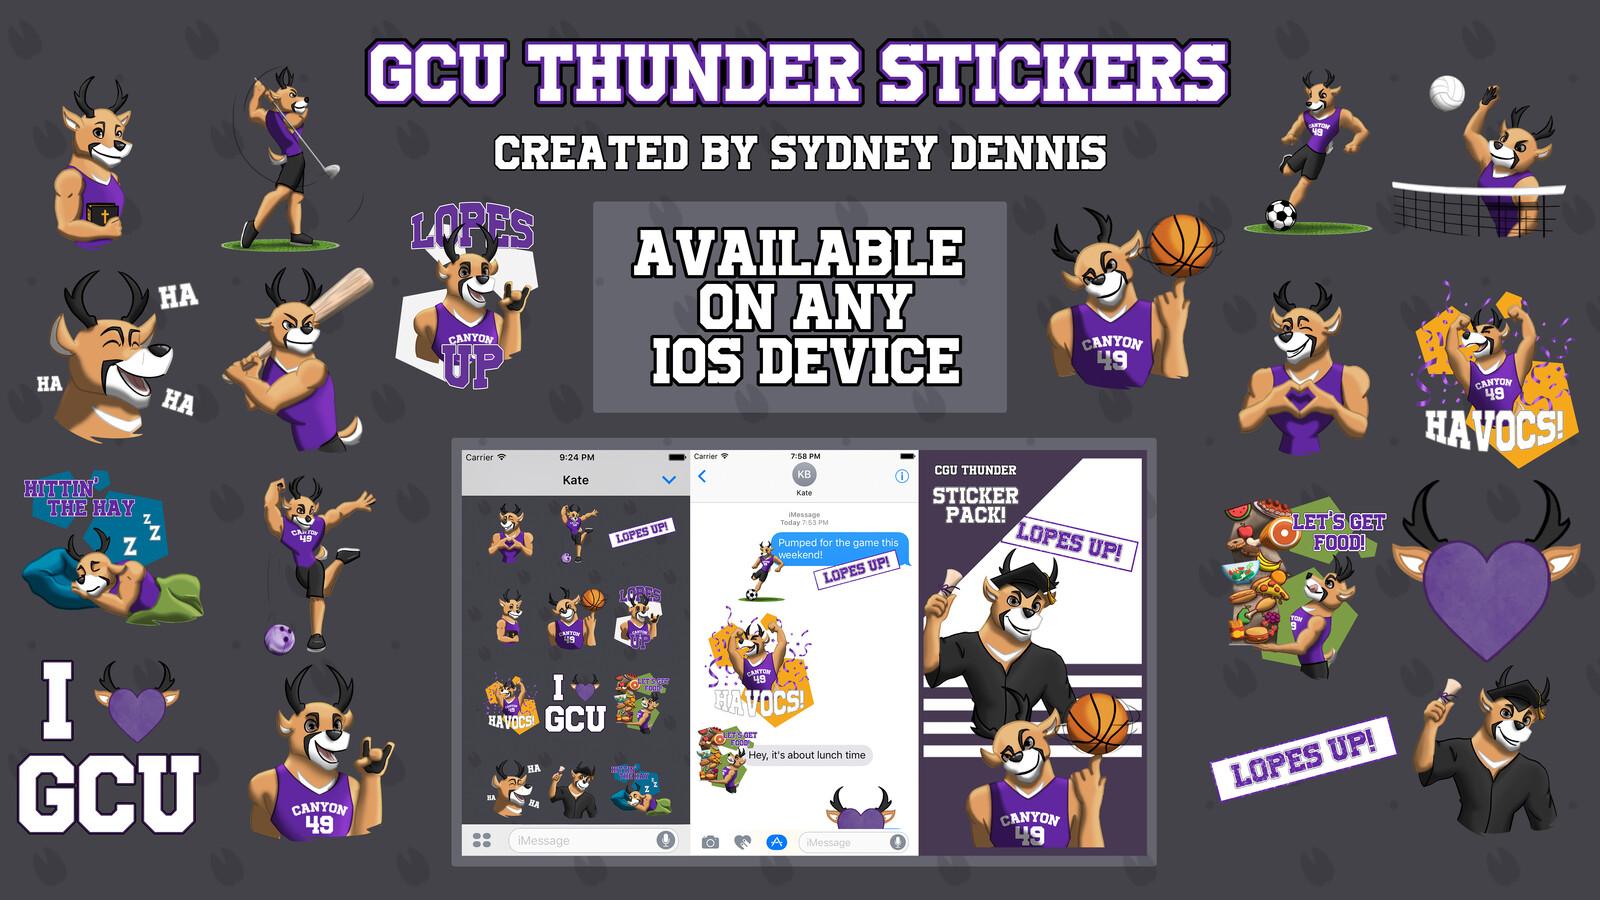 App Link: https://apps.apple.com/us/app/gcu-thunder-stickers/id1273454335?app=messages